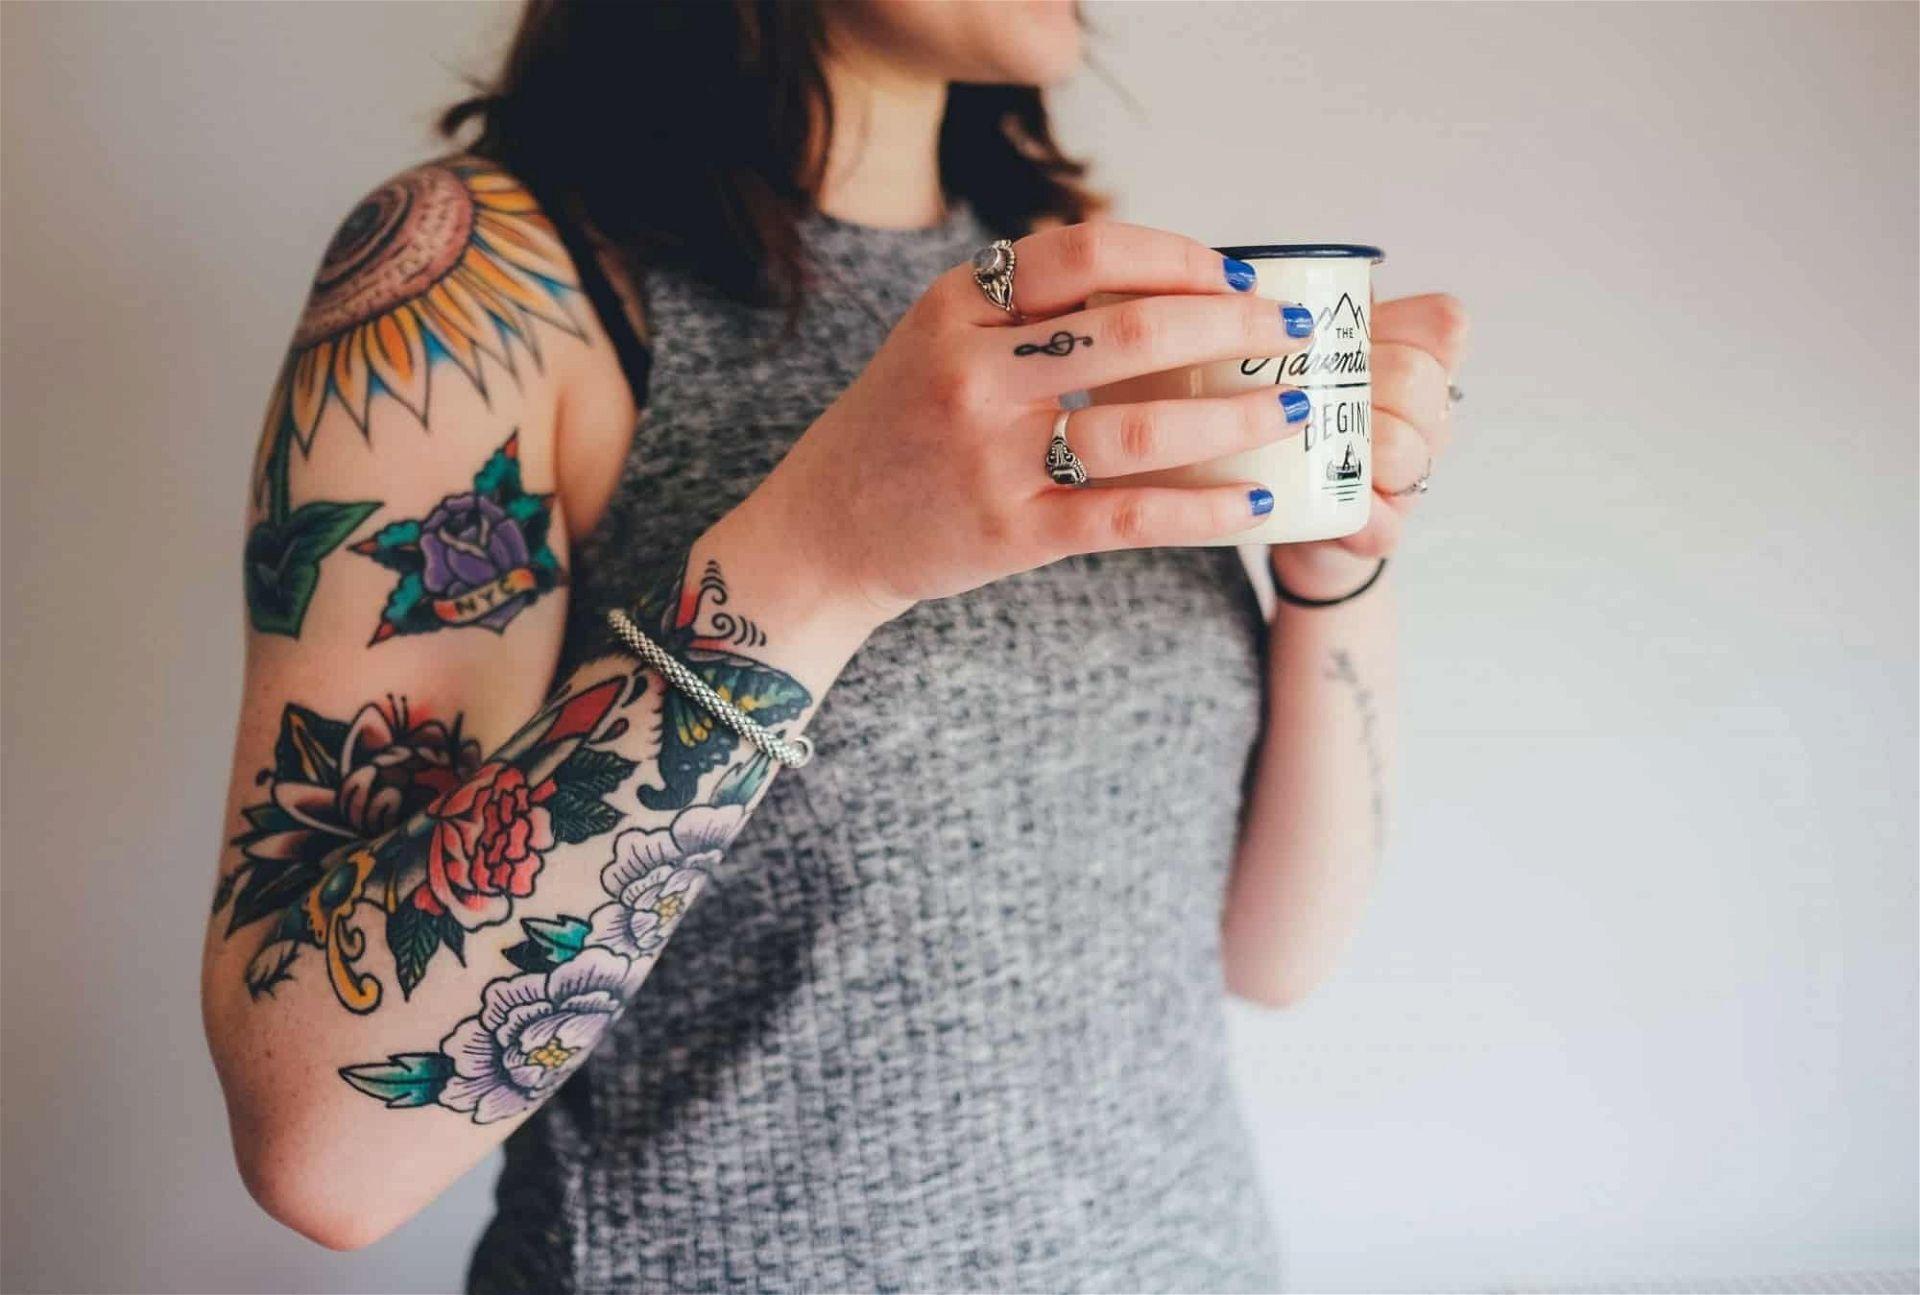 annie-spratt-unsplash-tatoo